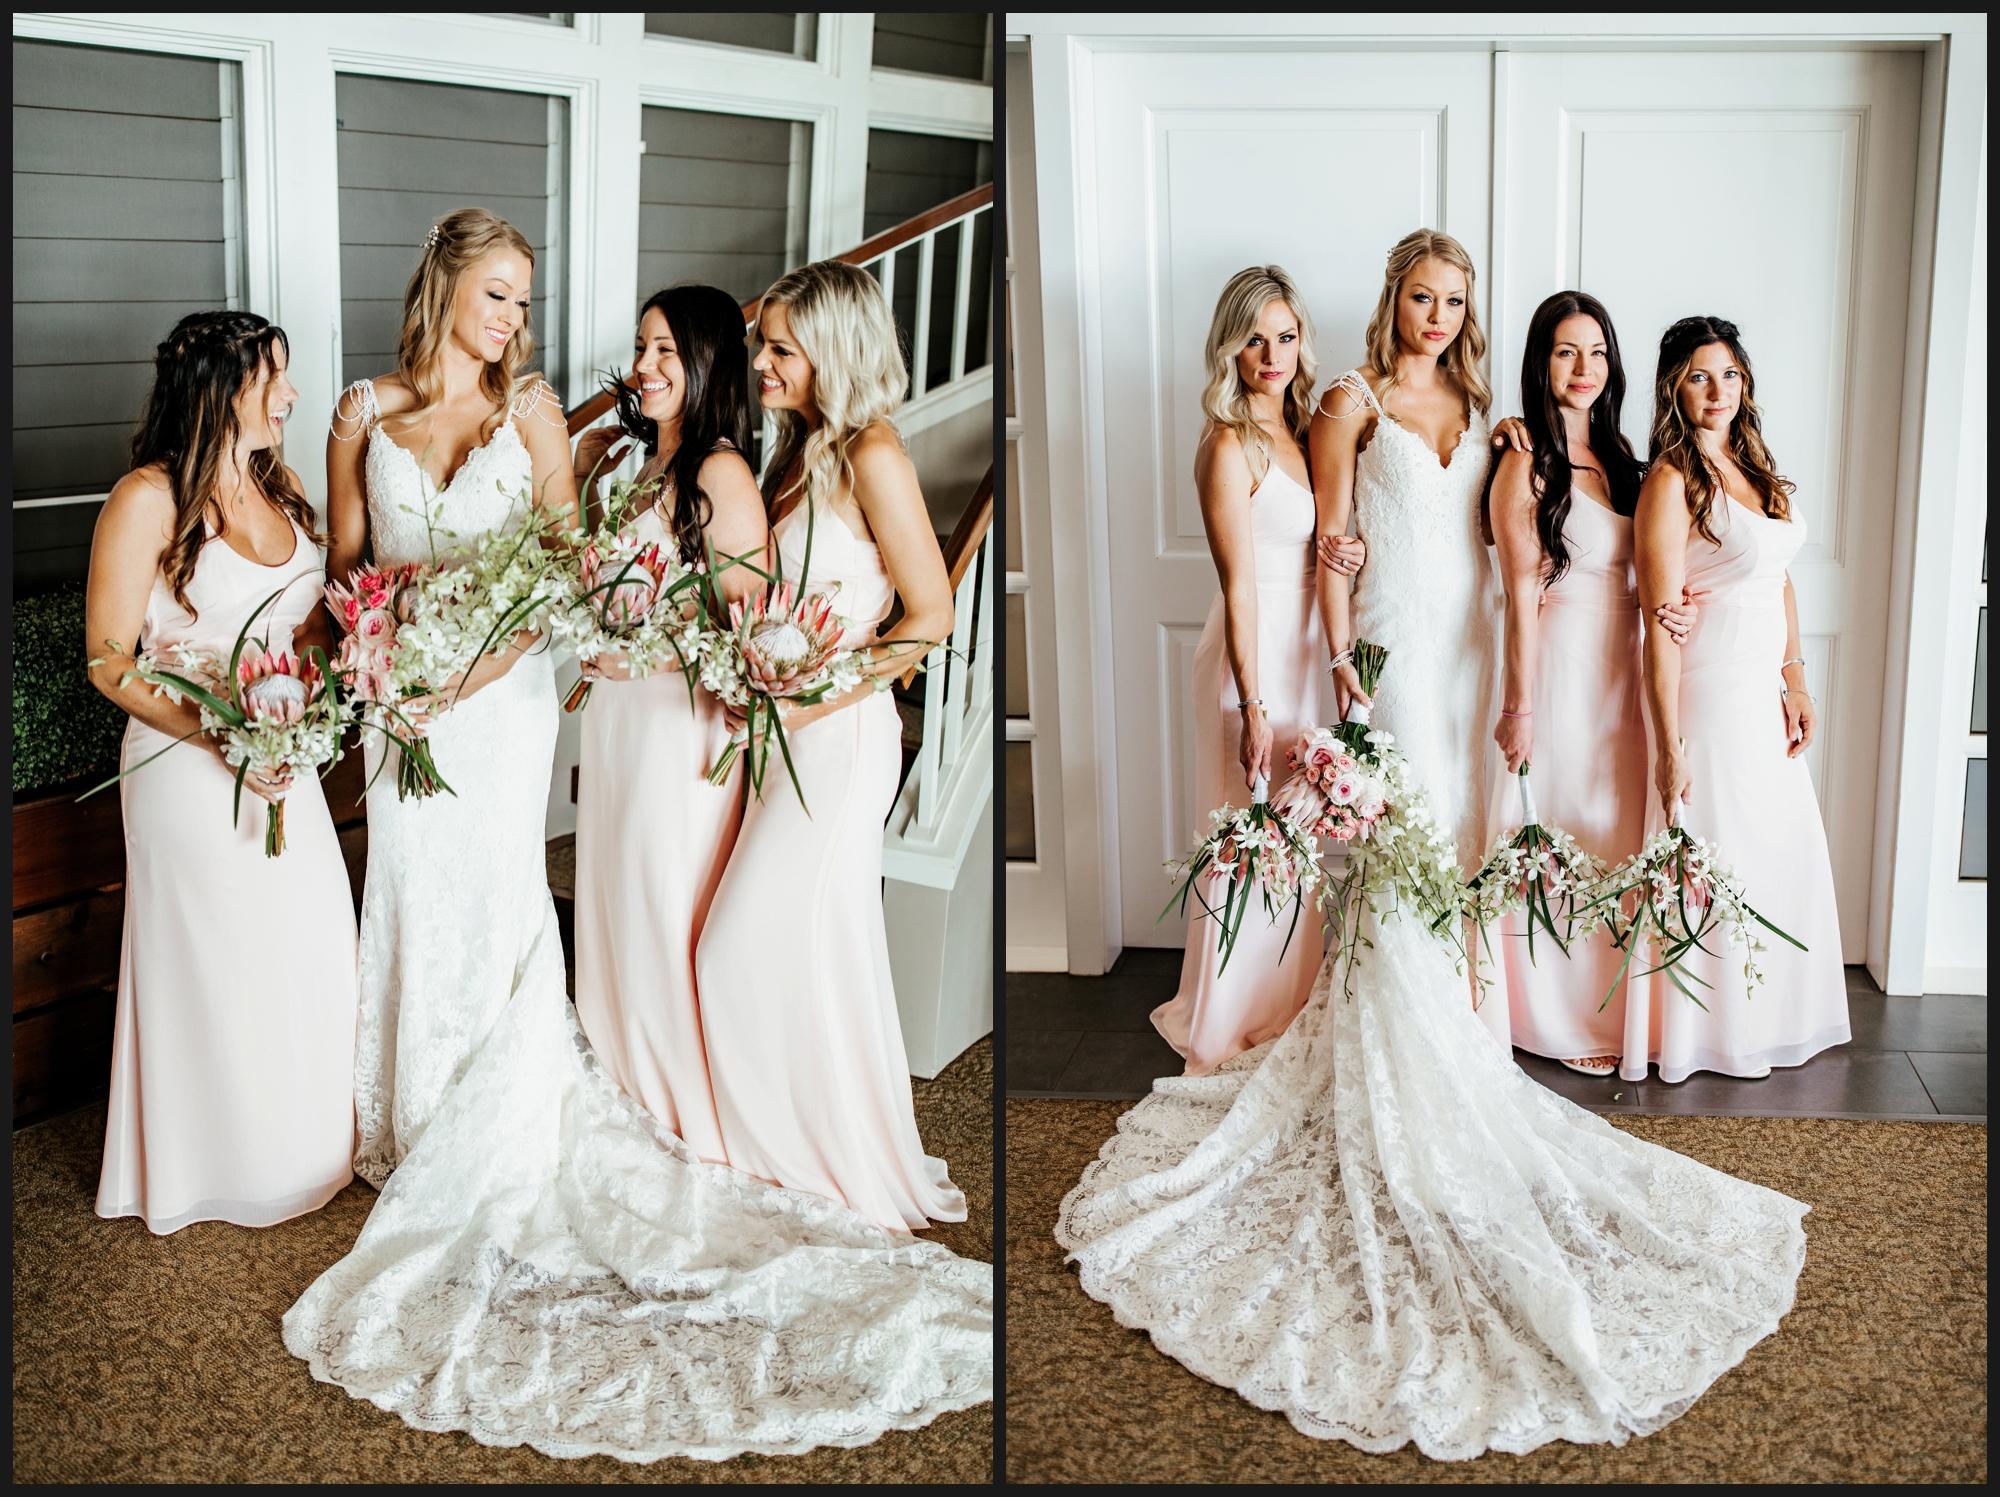 Orlando-Wedding-Photographer-destination-wedding-photographer-florida-wedding-photographer-hawaii-wedding-photographer_0011.jpg